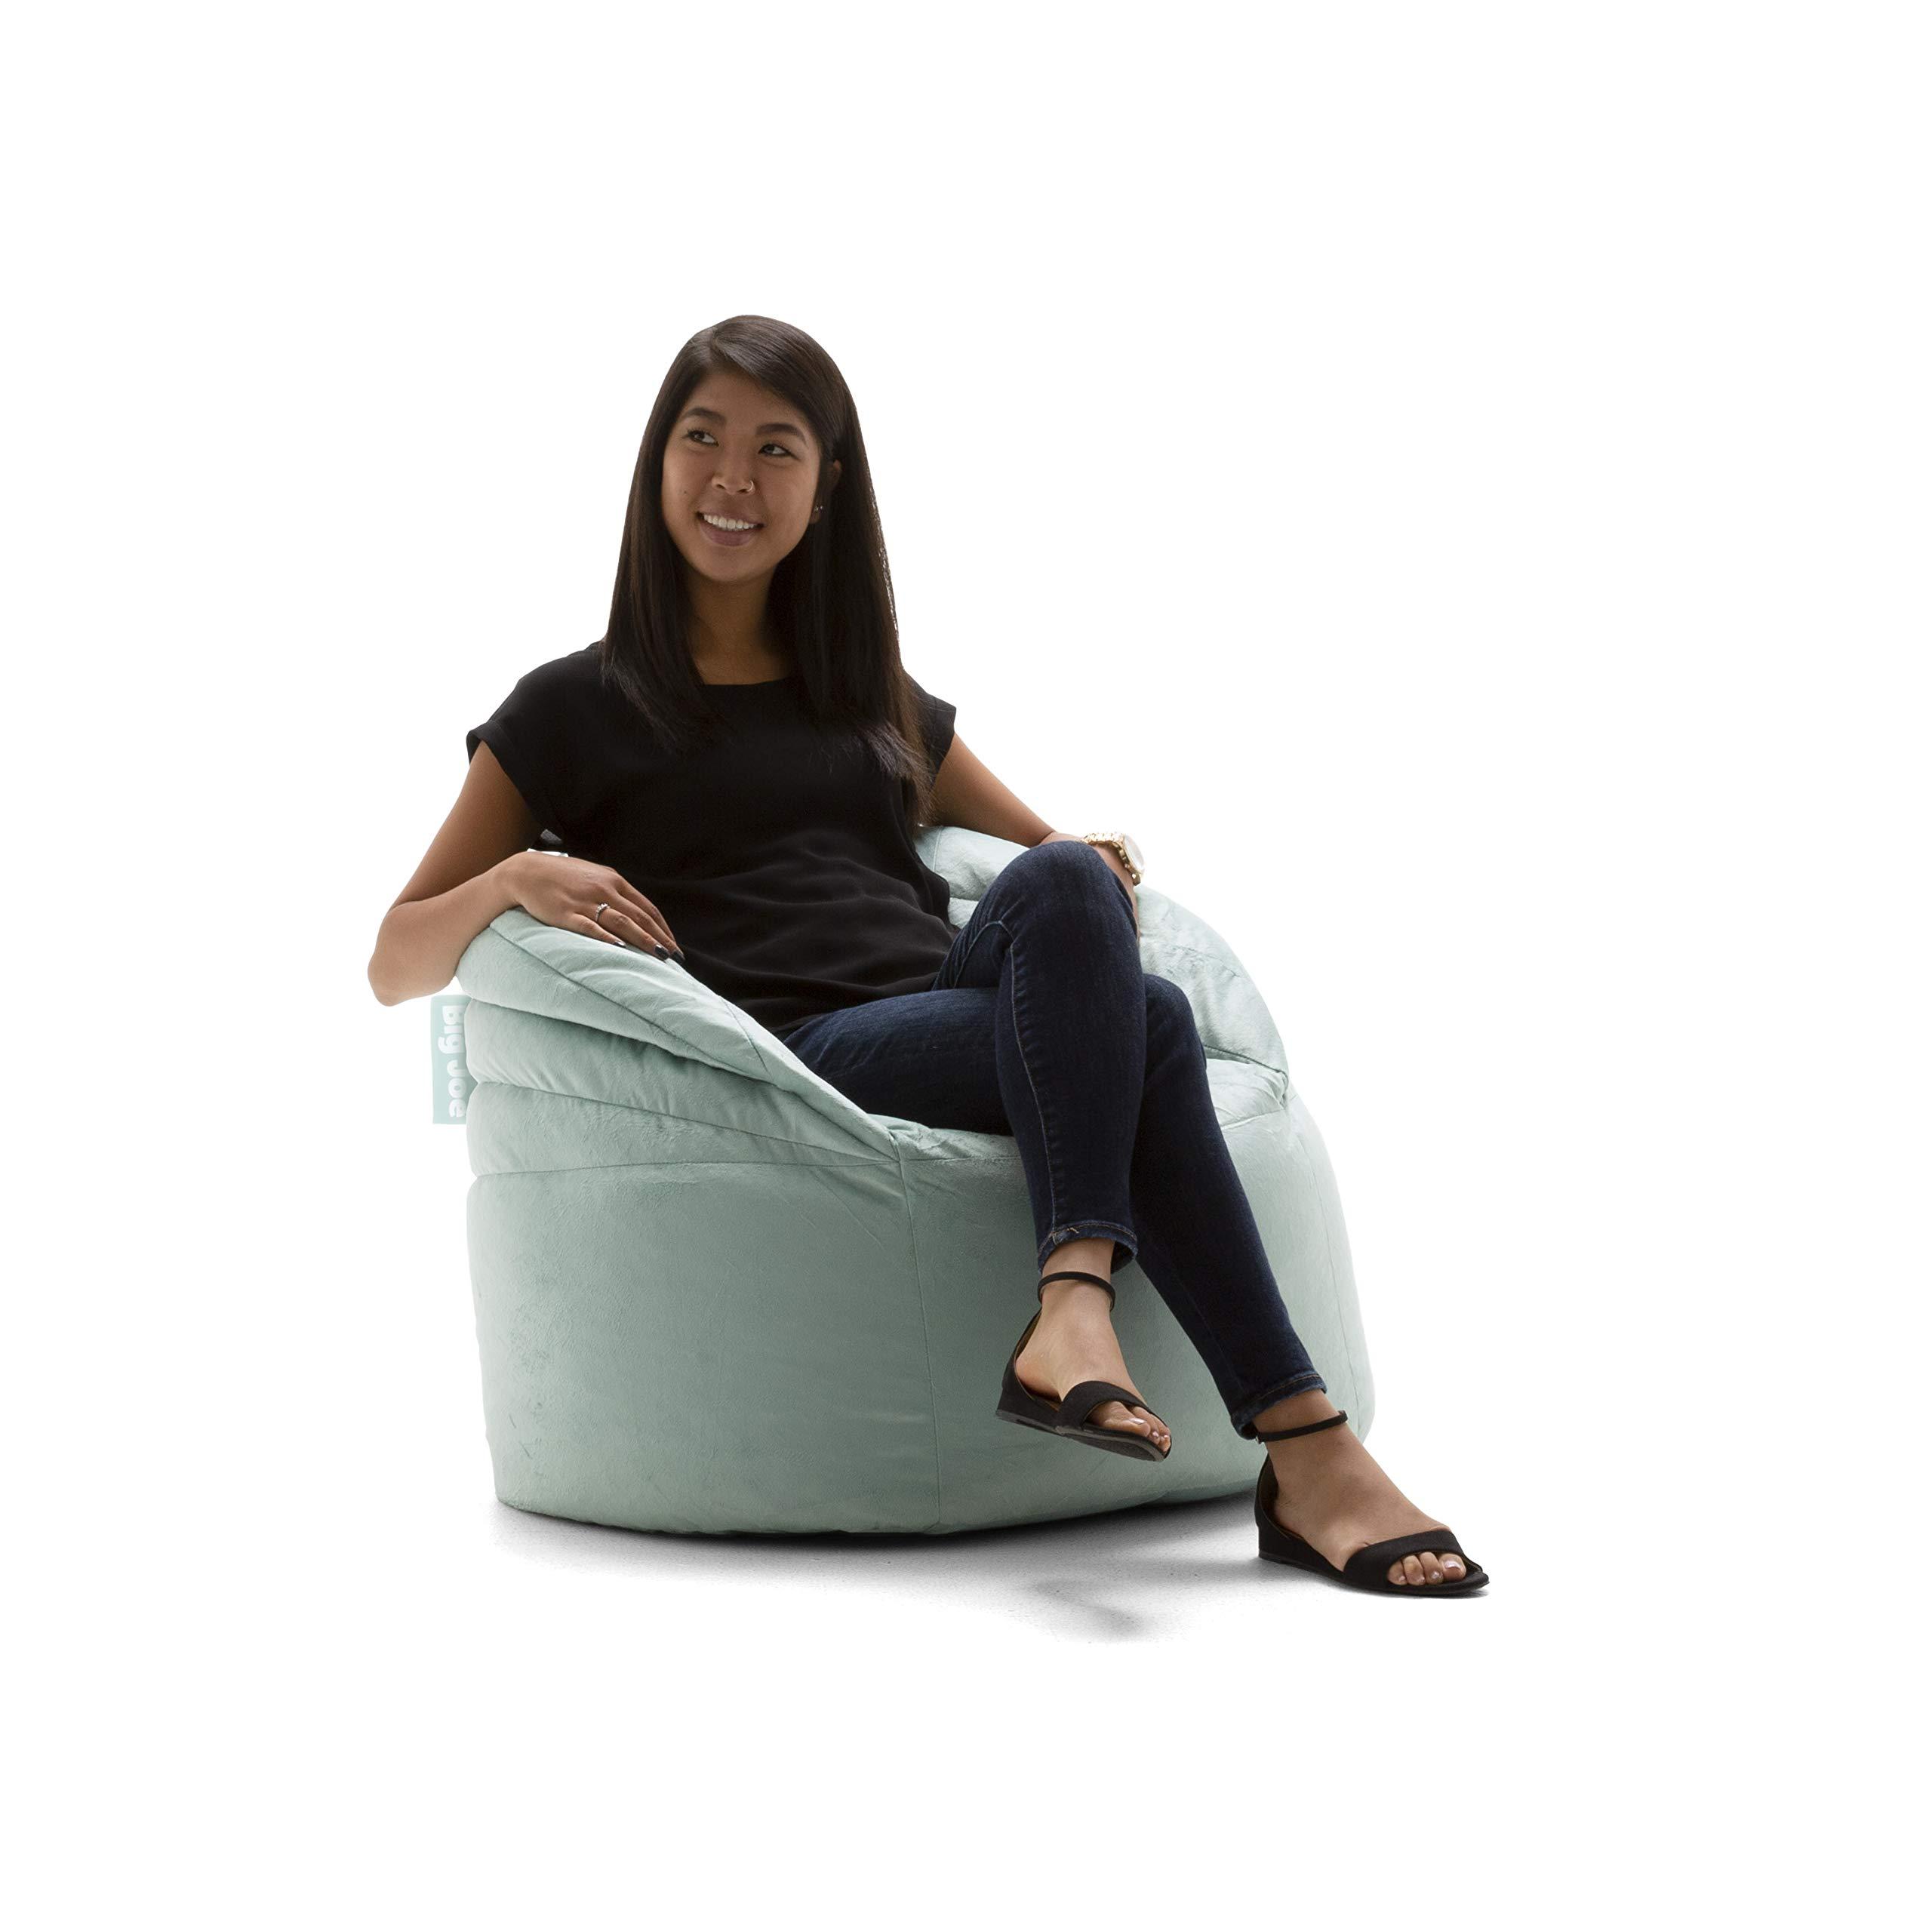 Big Joe 0680562 Stack Chair, Turquoise Plush Bean Bag by Big Joe